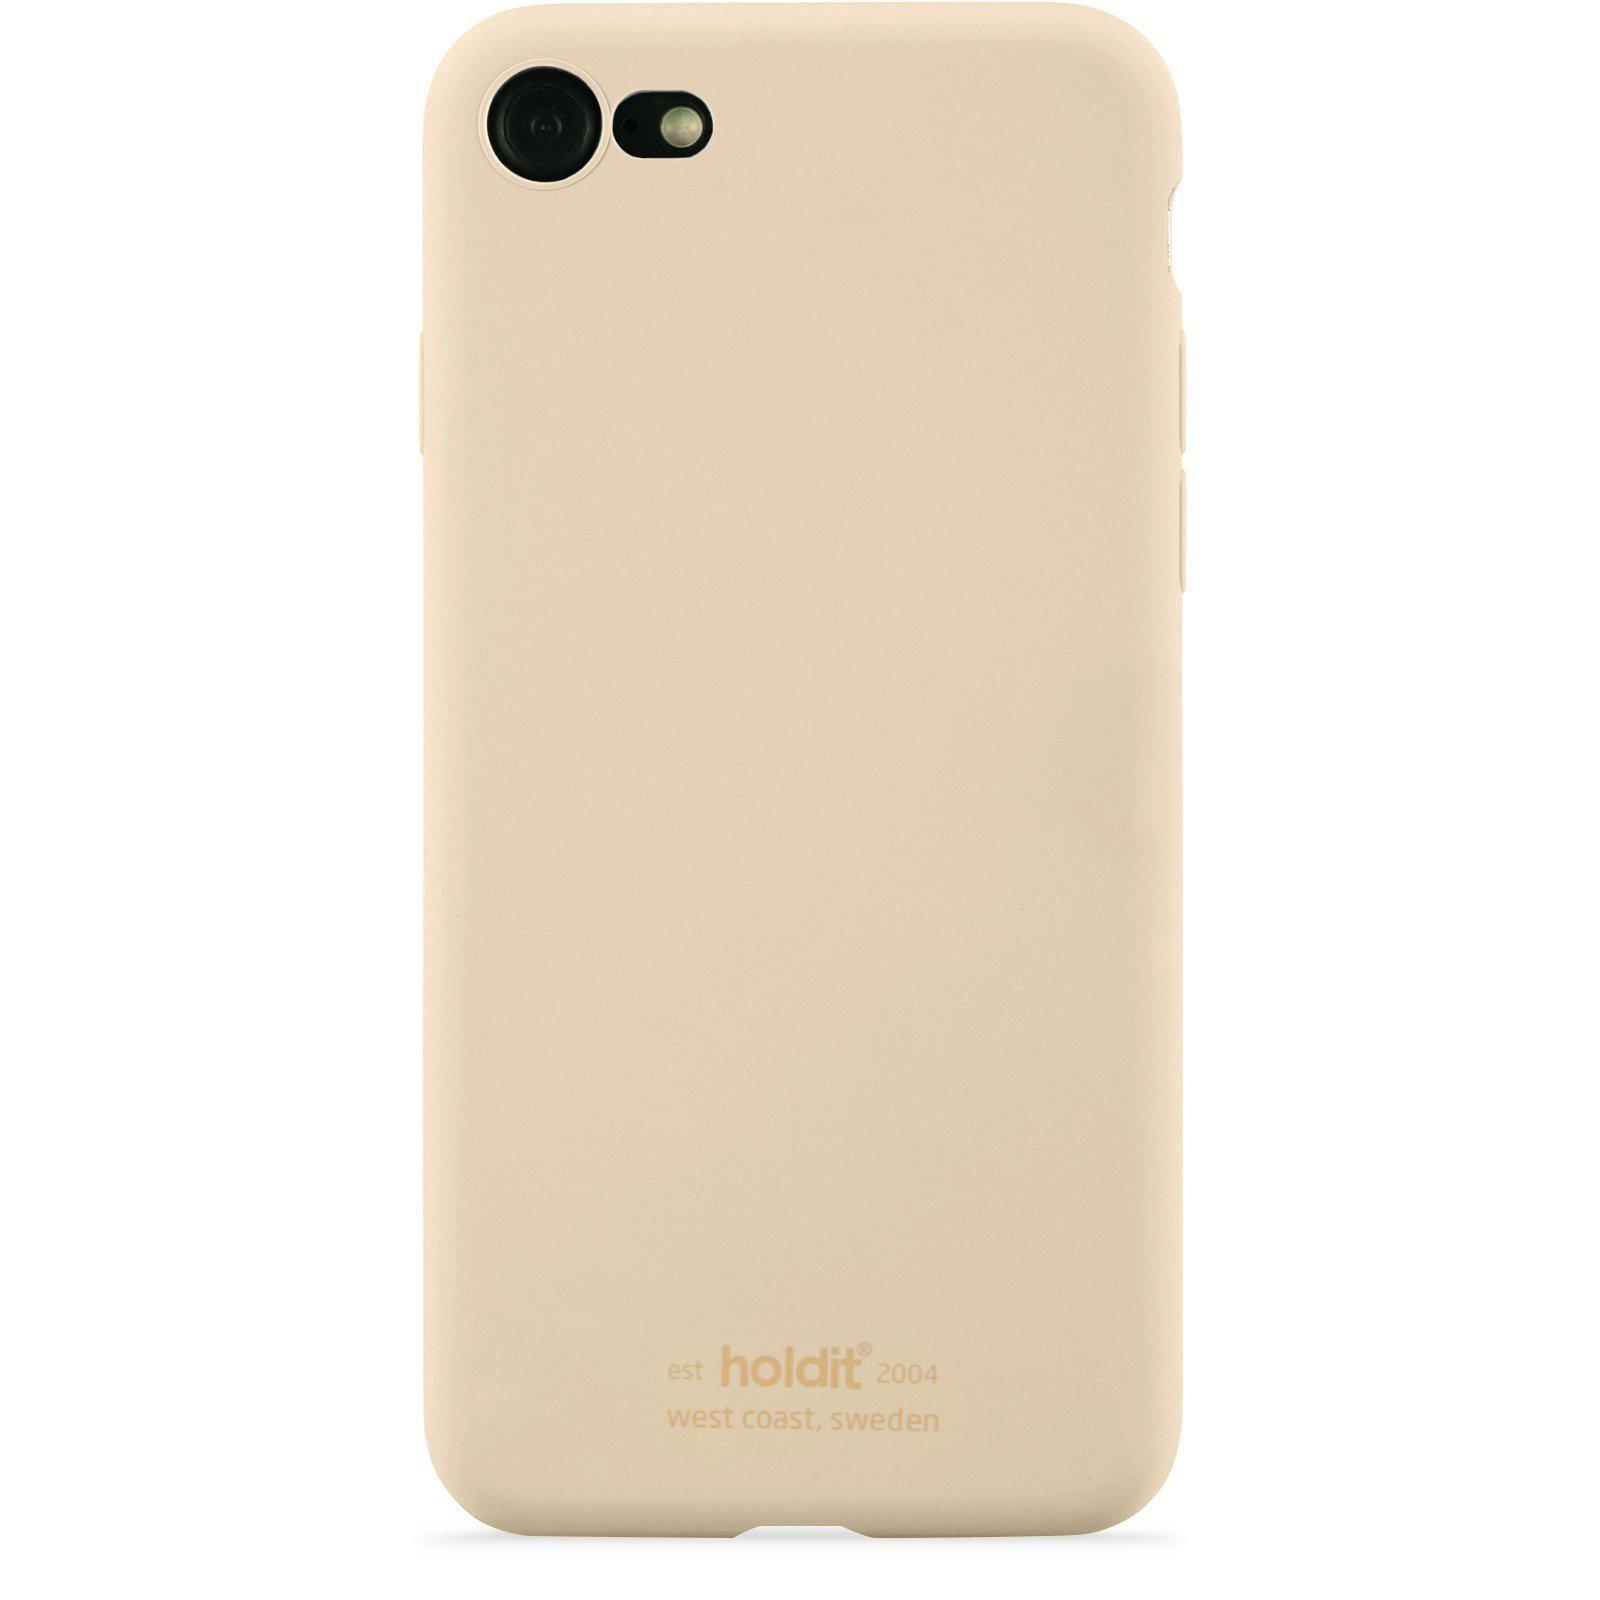 Silikonskal iPhone 7/8/SE 2020 Beige